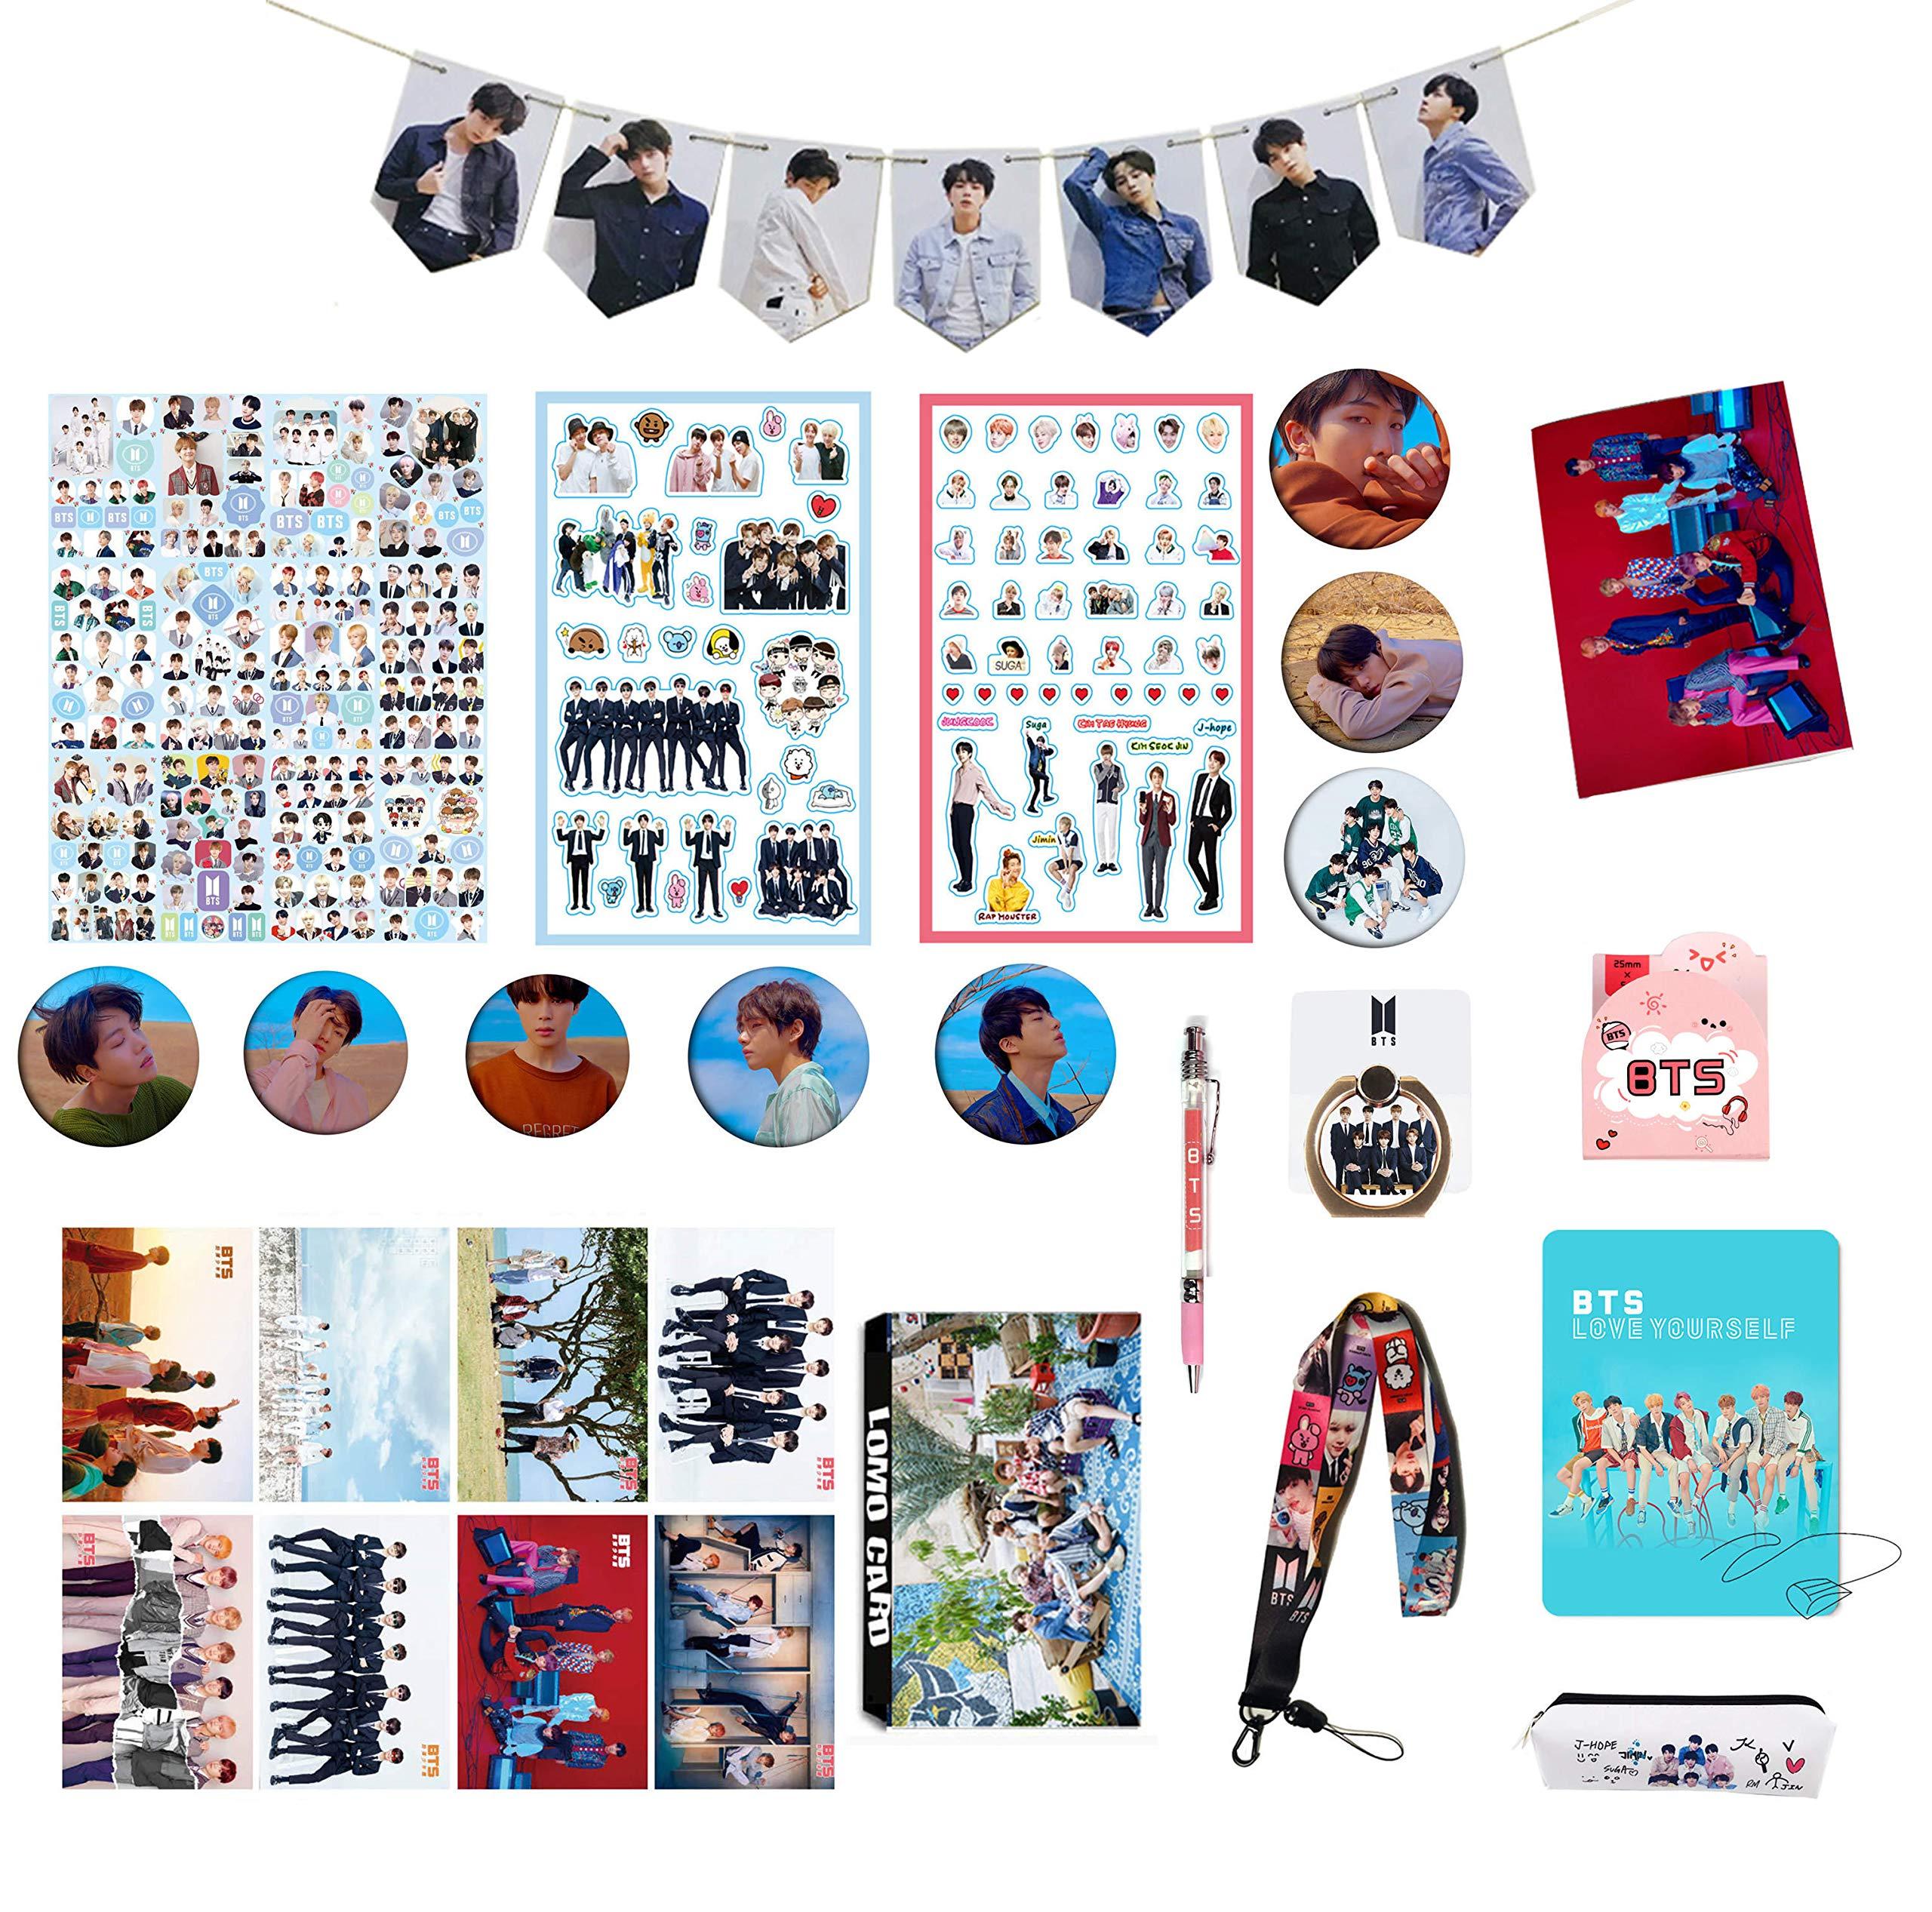 BTS Gifts Set for Army Bangtan Boys BTS Collectibles, BTS Pin, BTS Poster, BTS Sticker, etc (3)